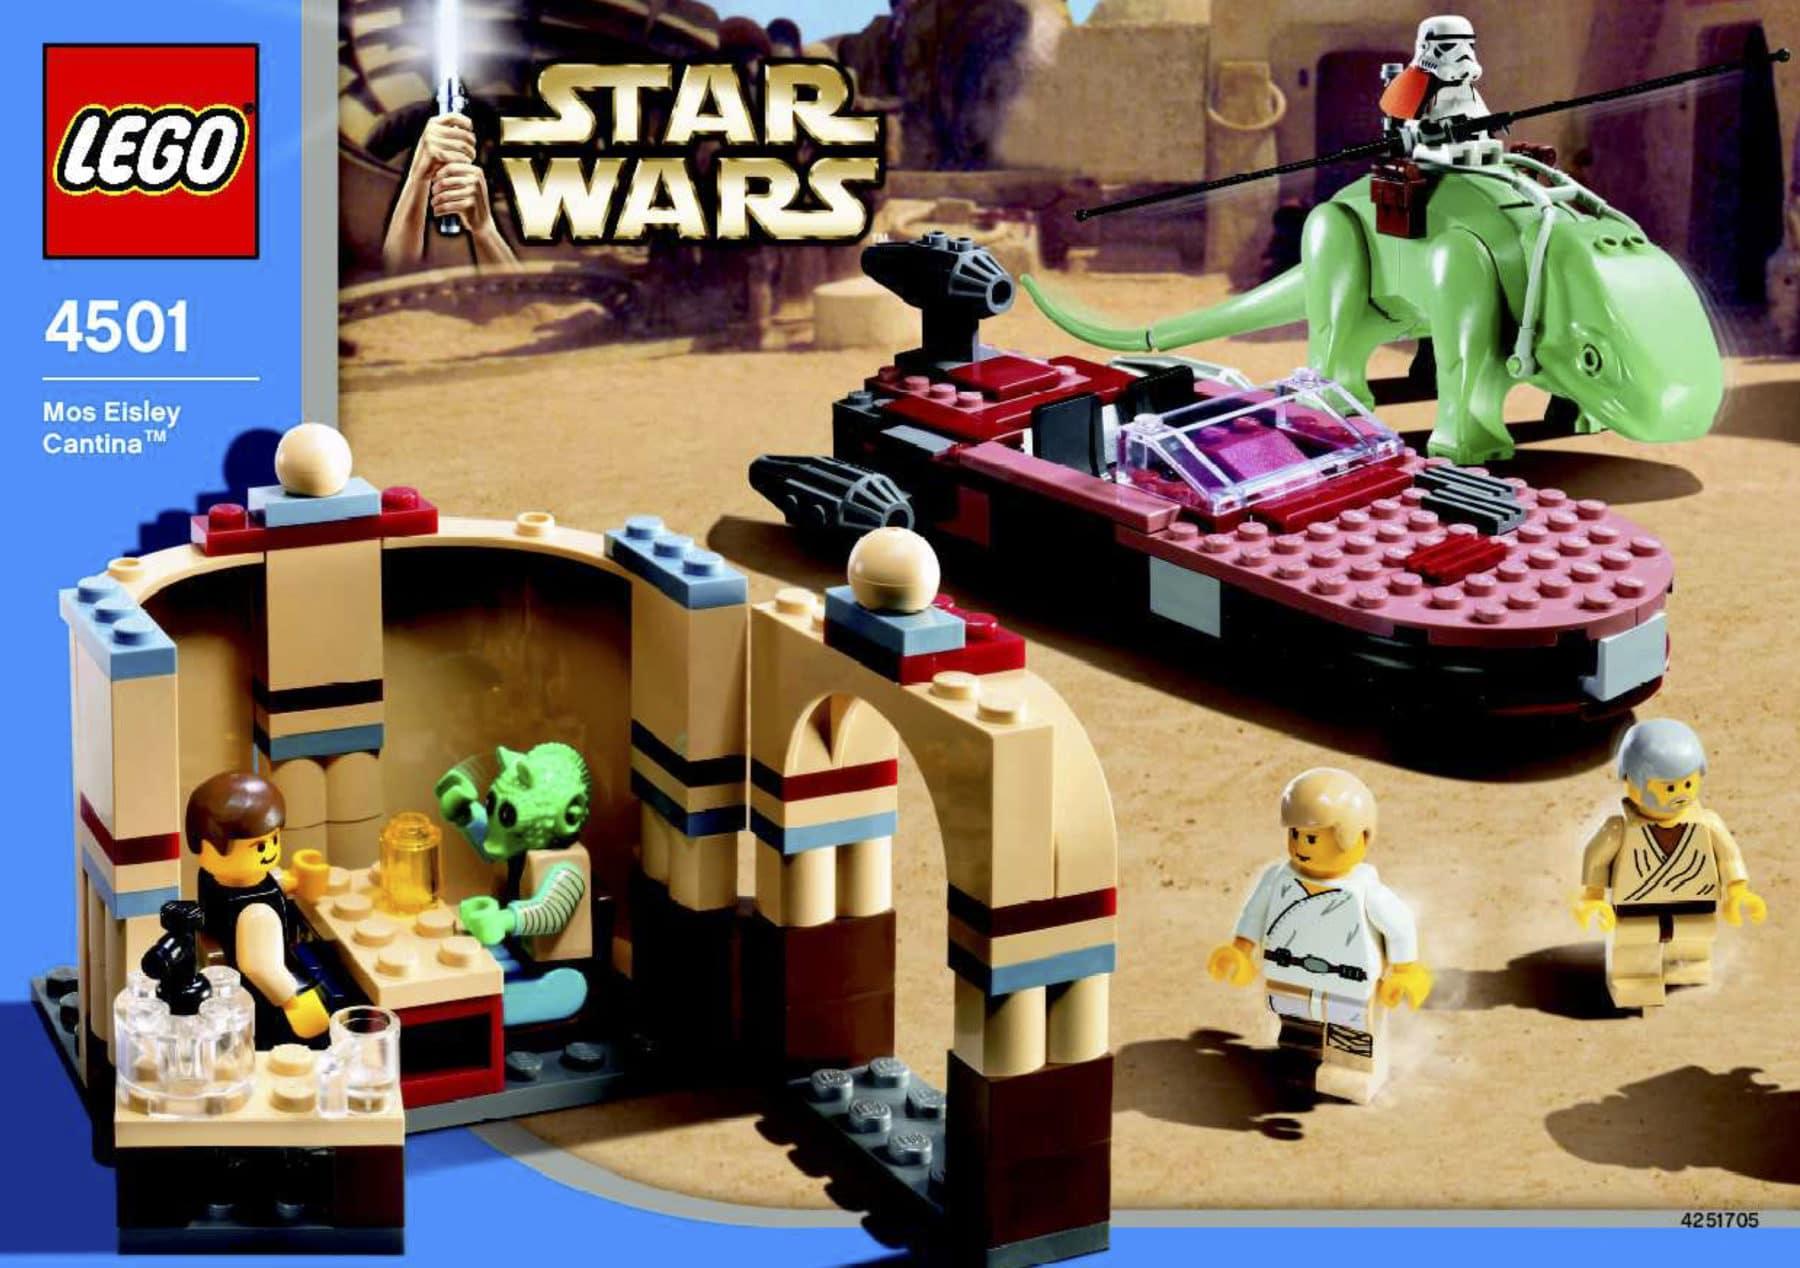 LEGO Star Wars 4501 Mos Eisley Cantina